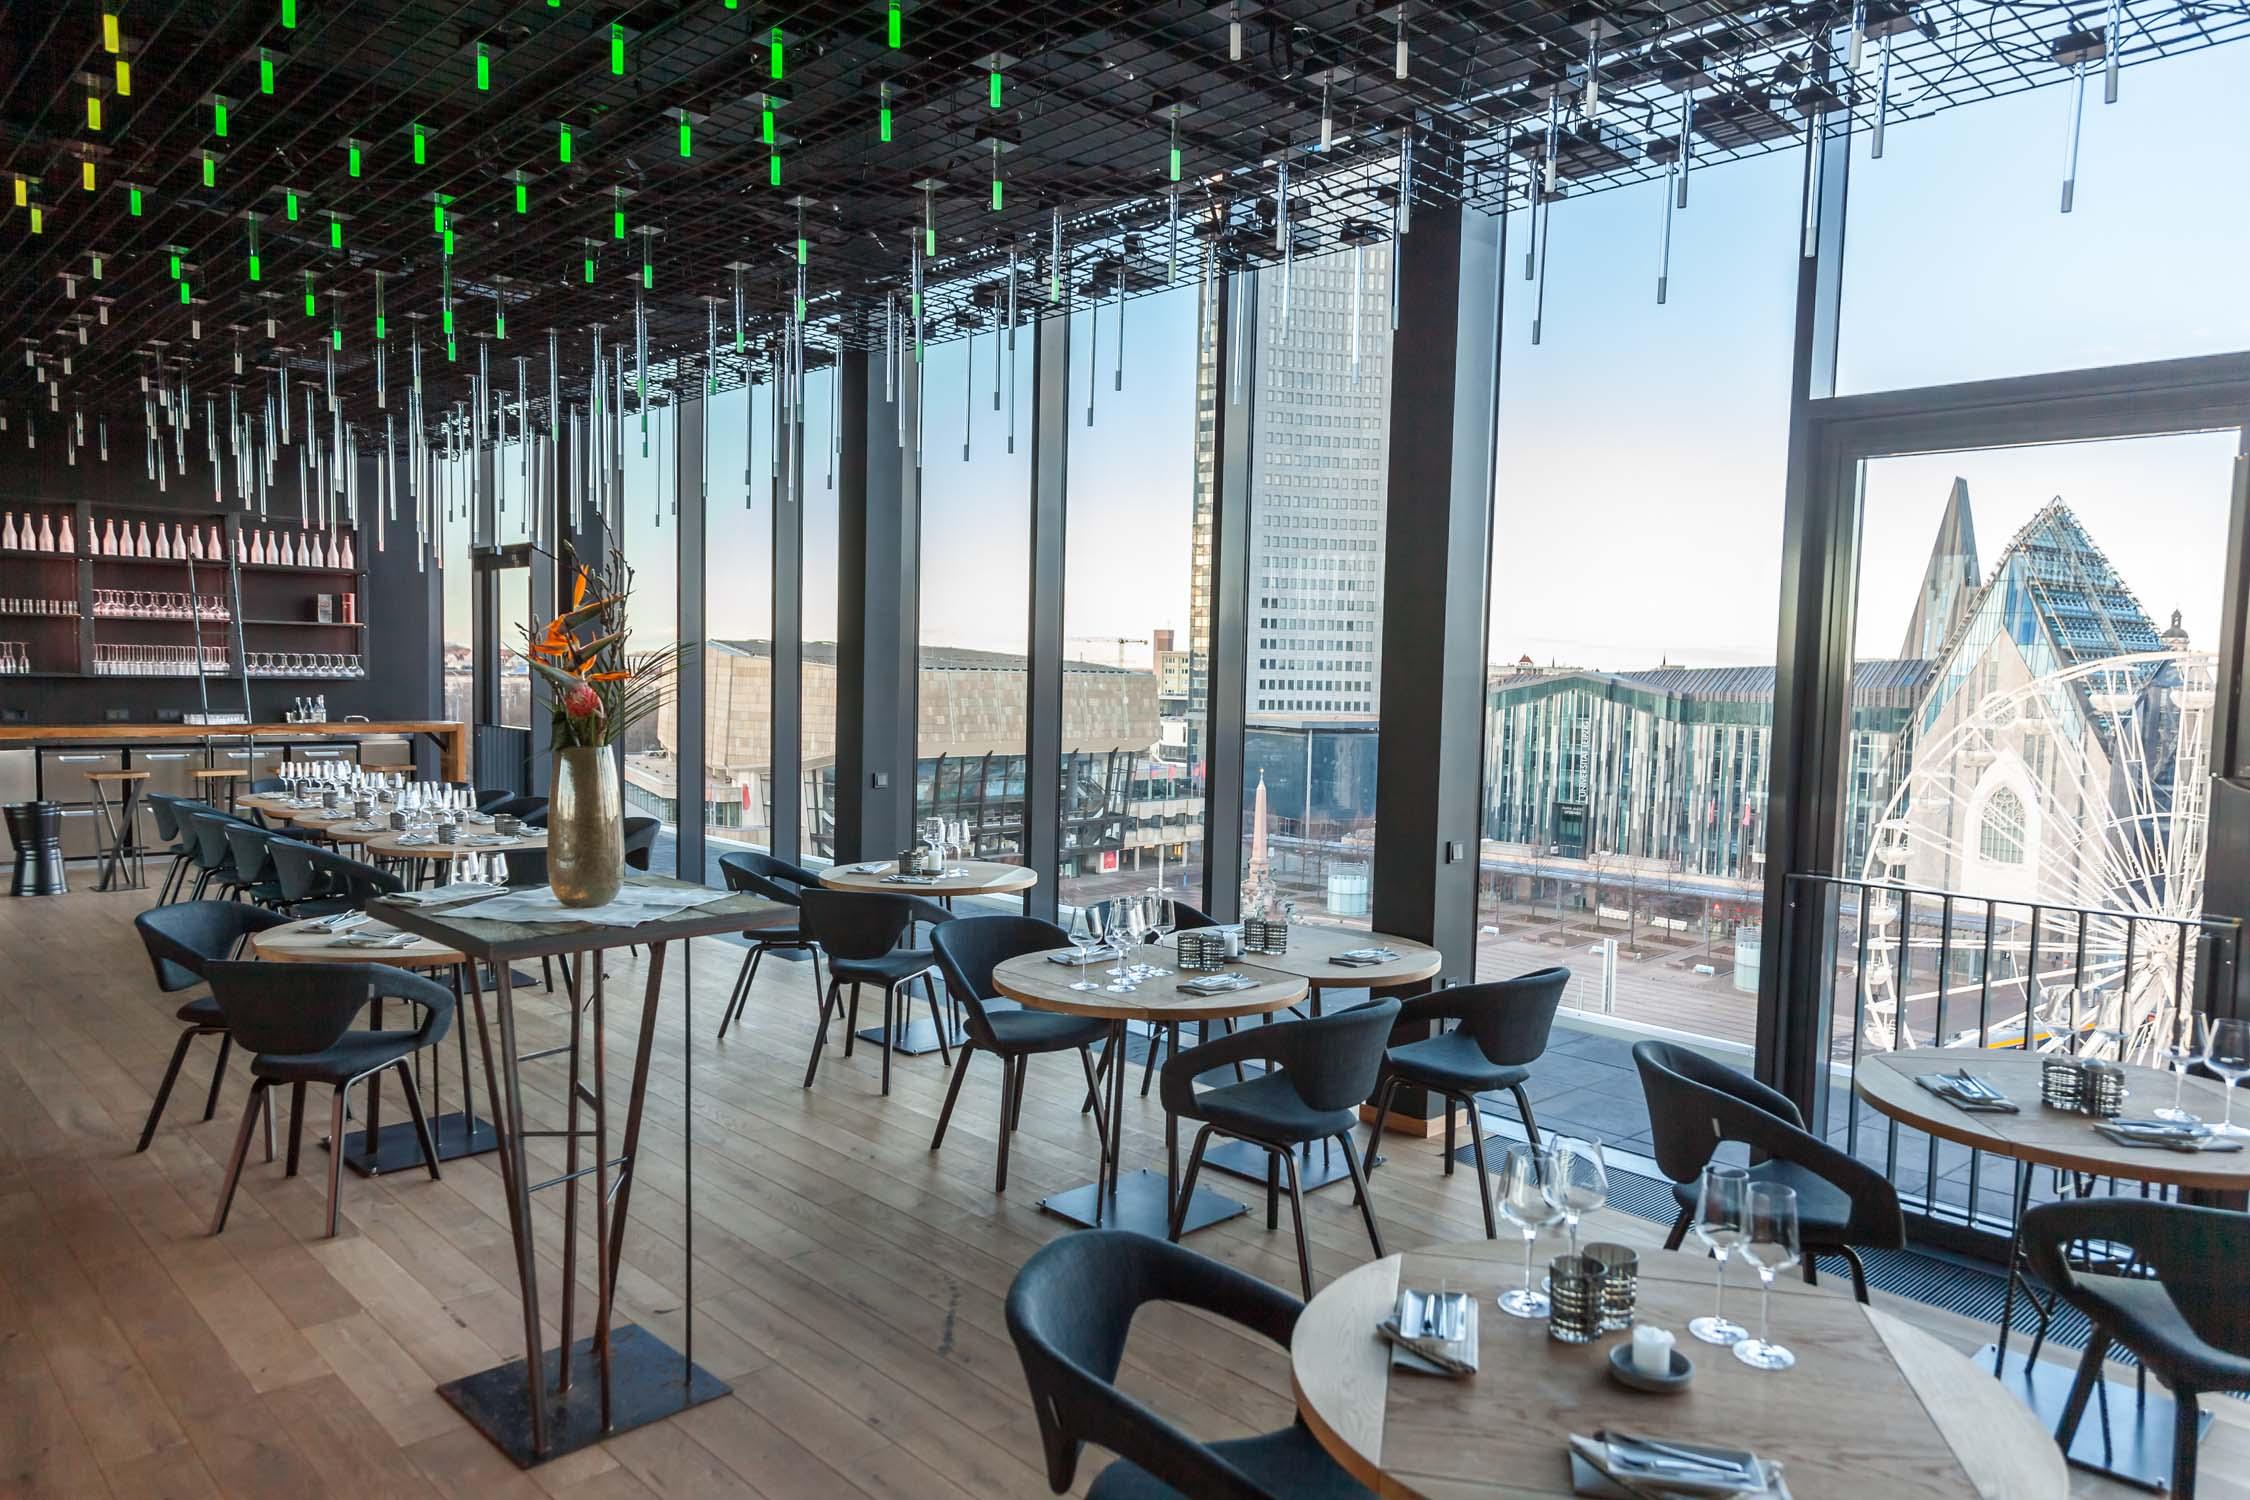 Restaurant Felix, Leipzig